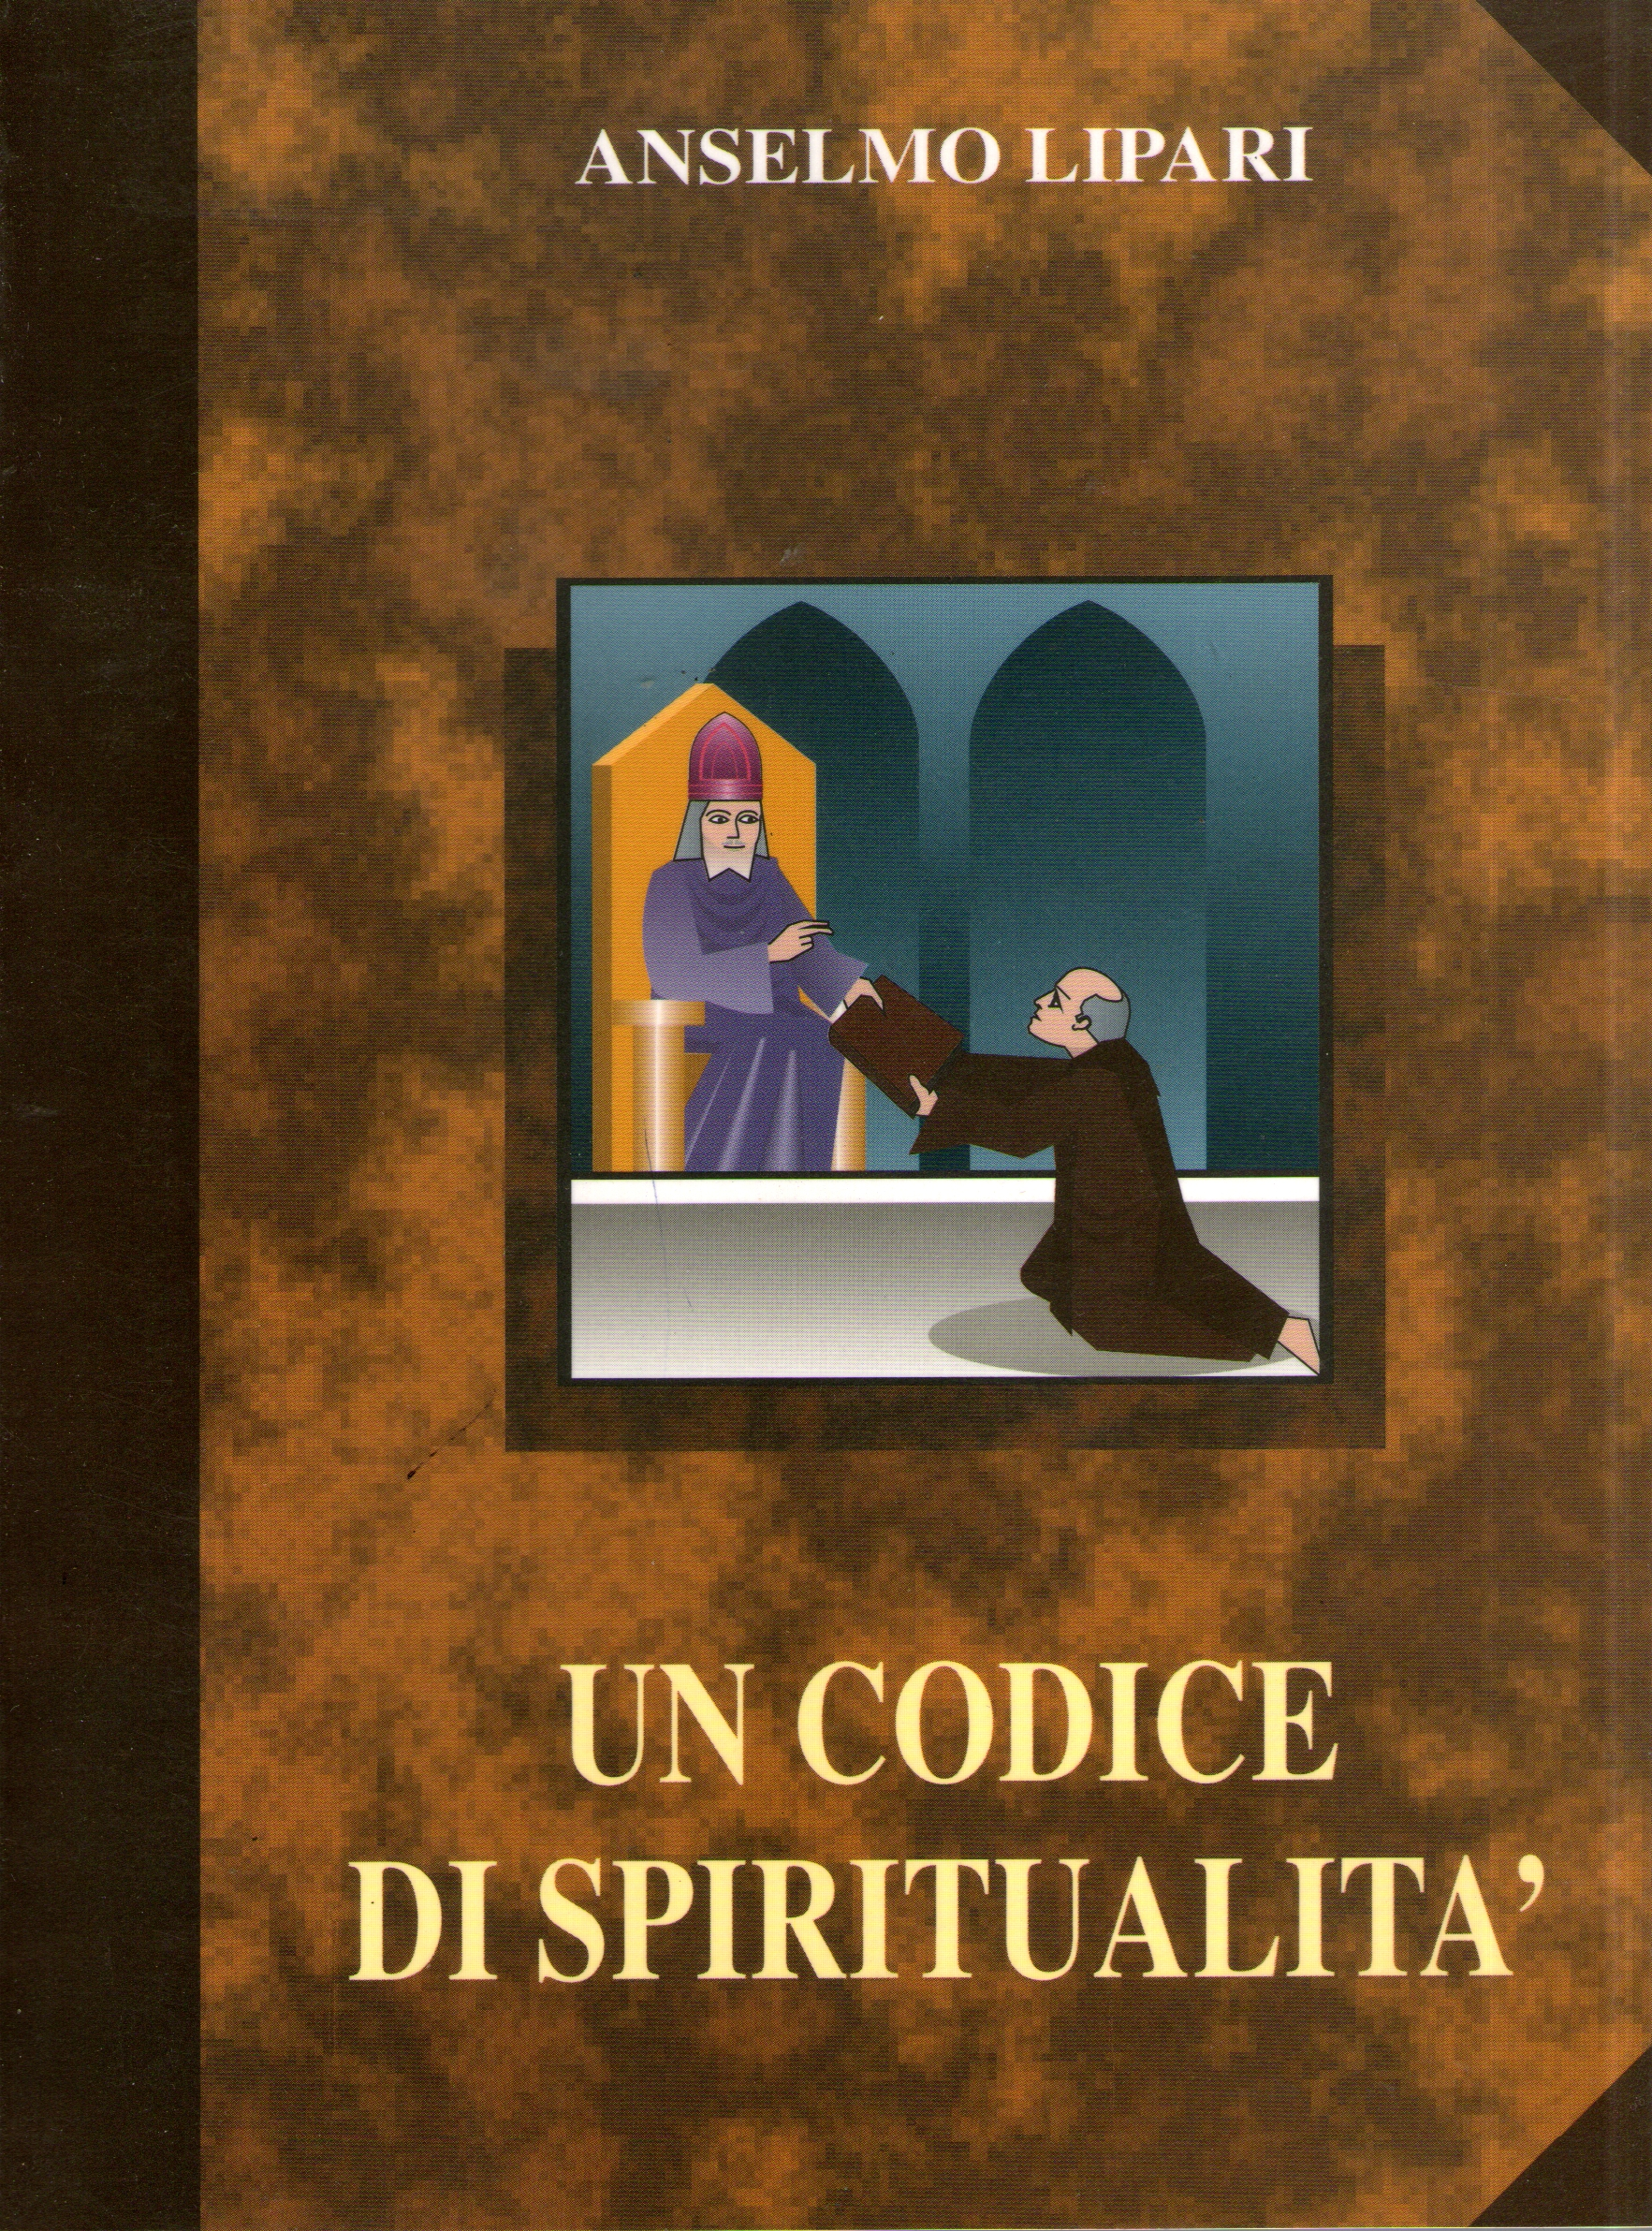 Un codice di spiritualità